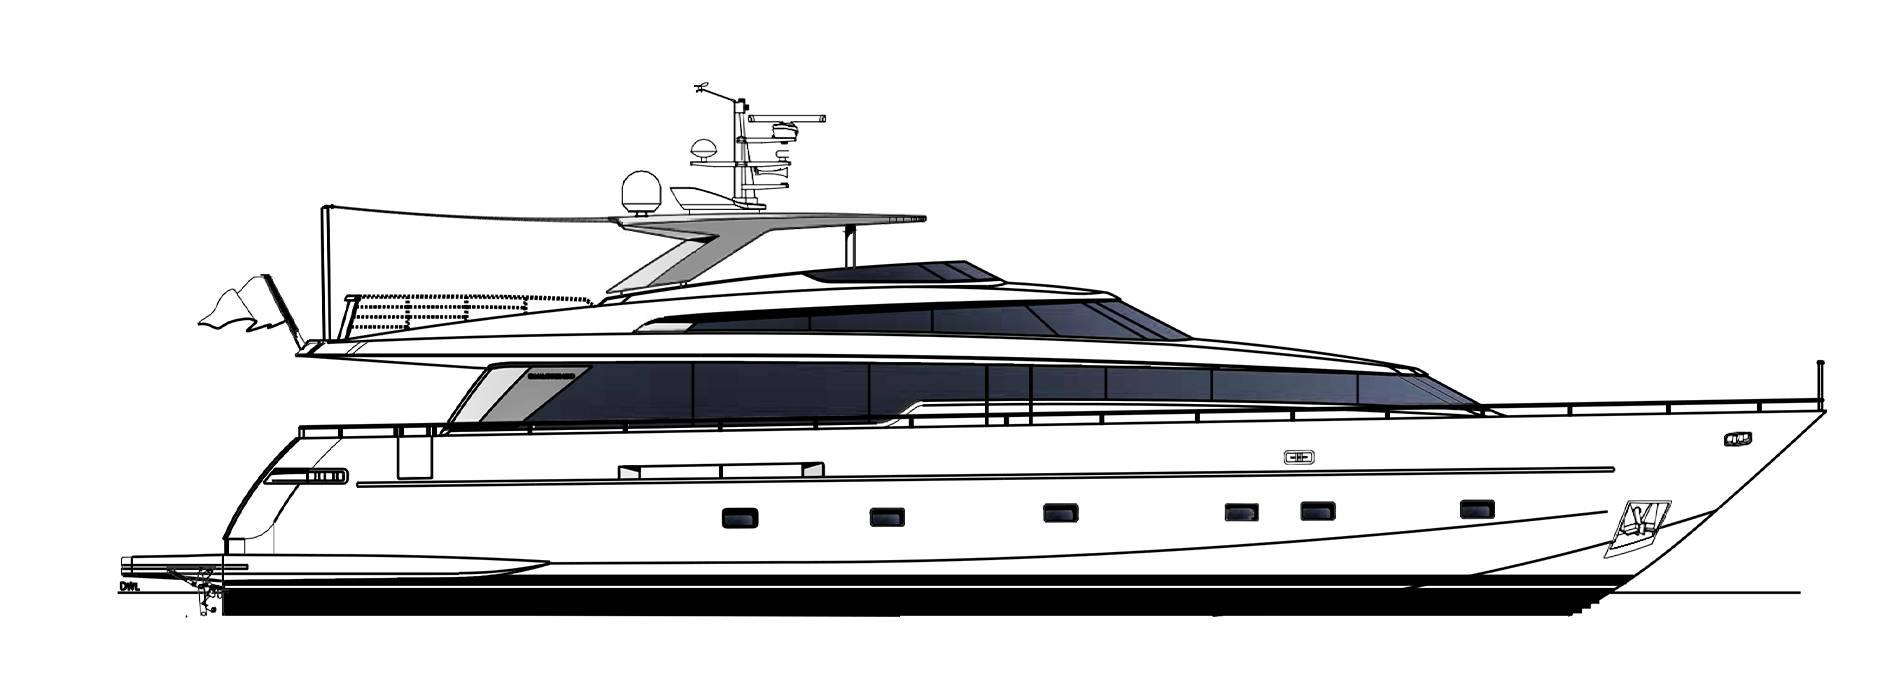 Sanlorenzo Yachts SL96-623 Profile